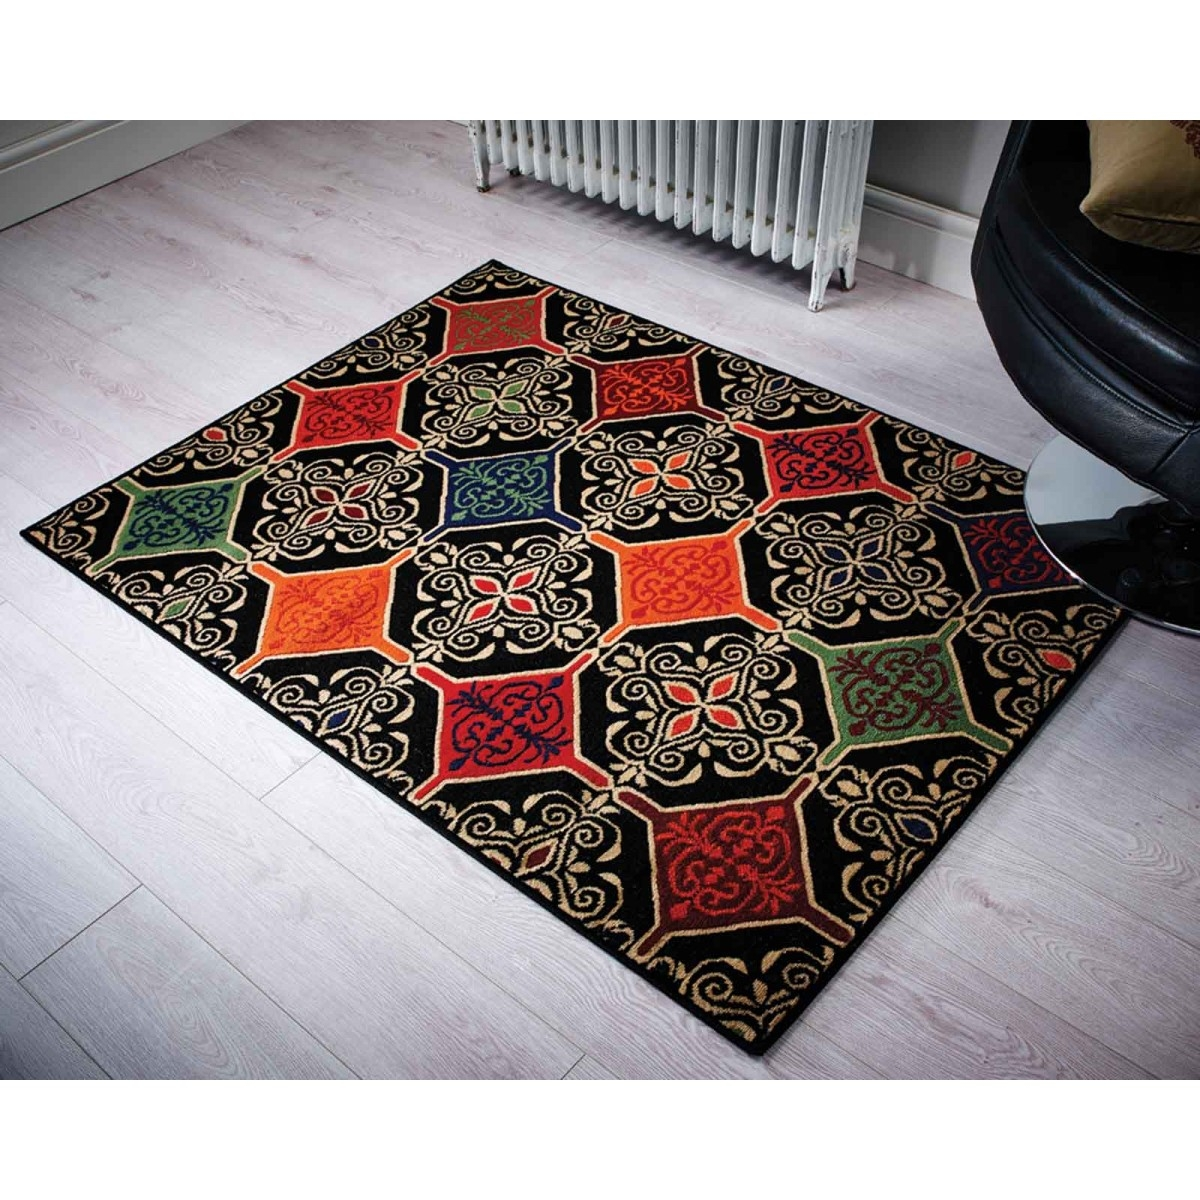 Retro Funky Mosaic Tiles Rug Flair Rugs Therugshopuk Regarding Retro Rugs (Image 9 of 15)